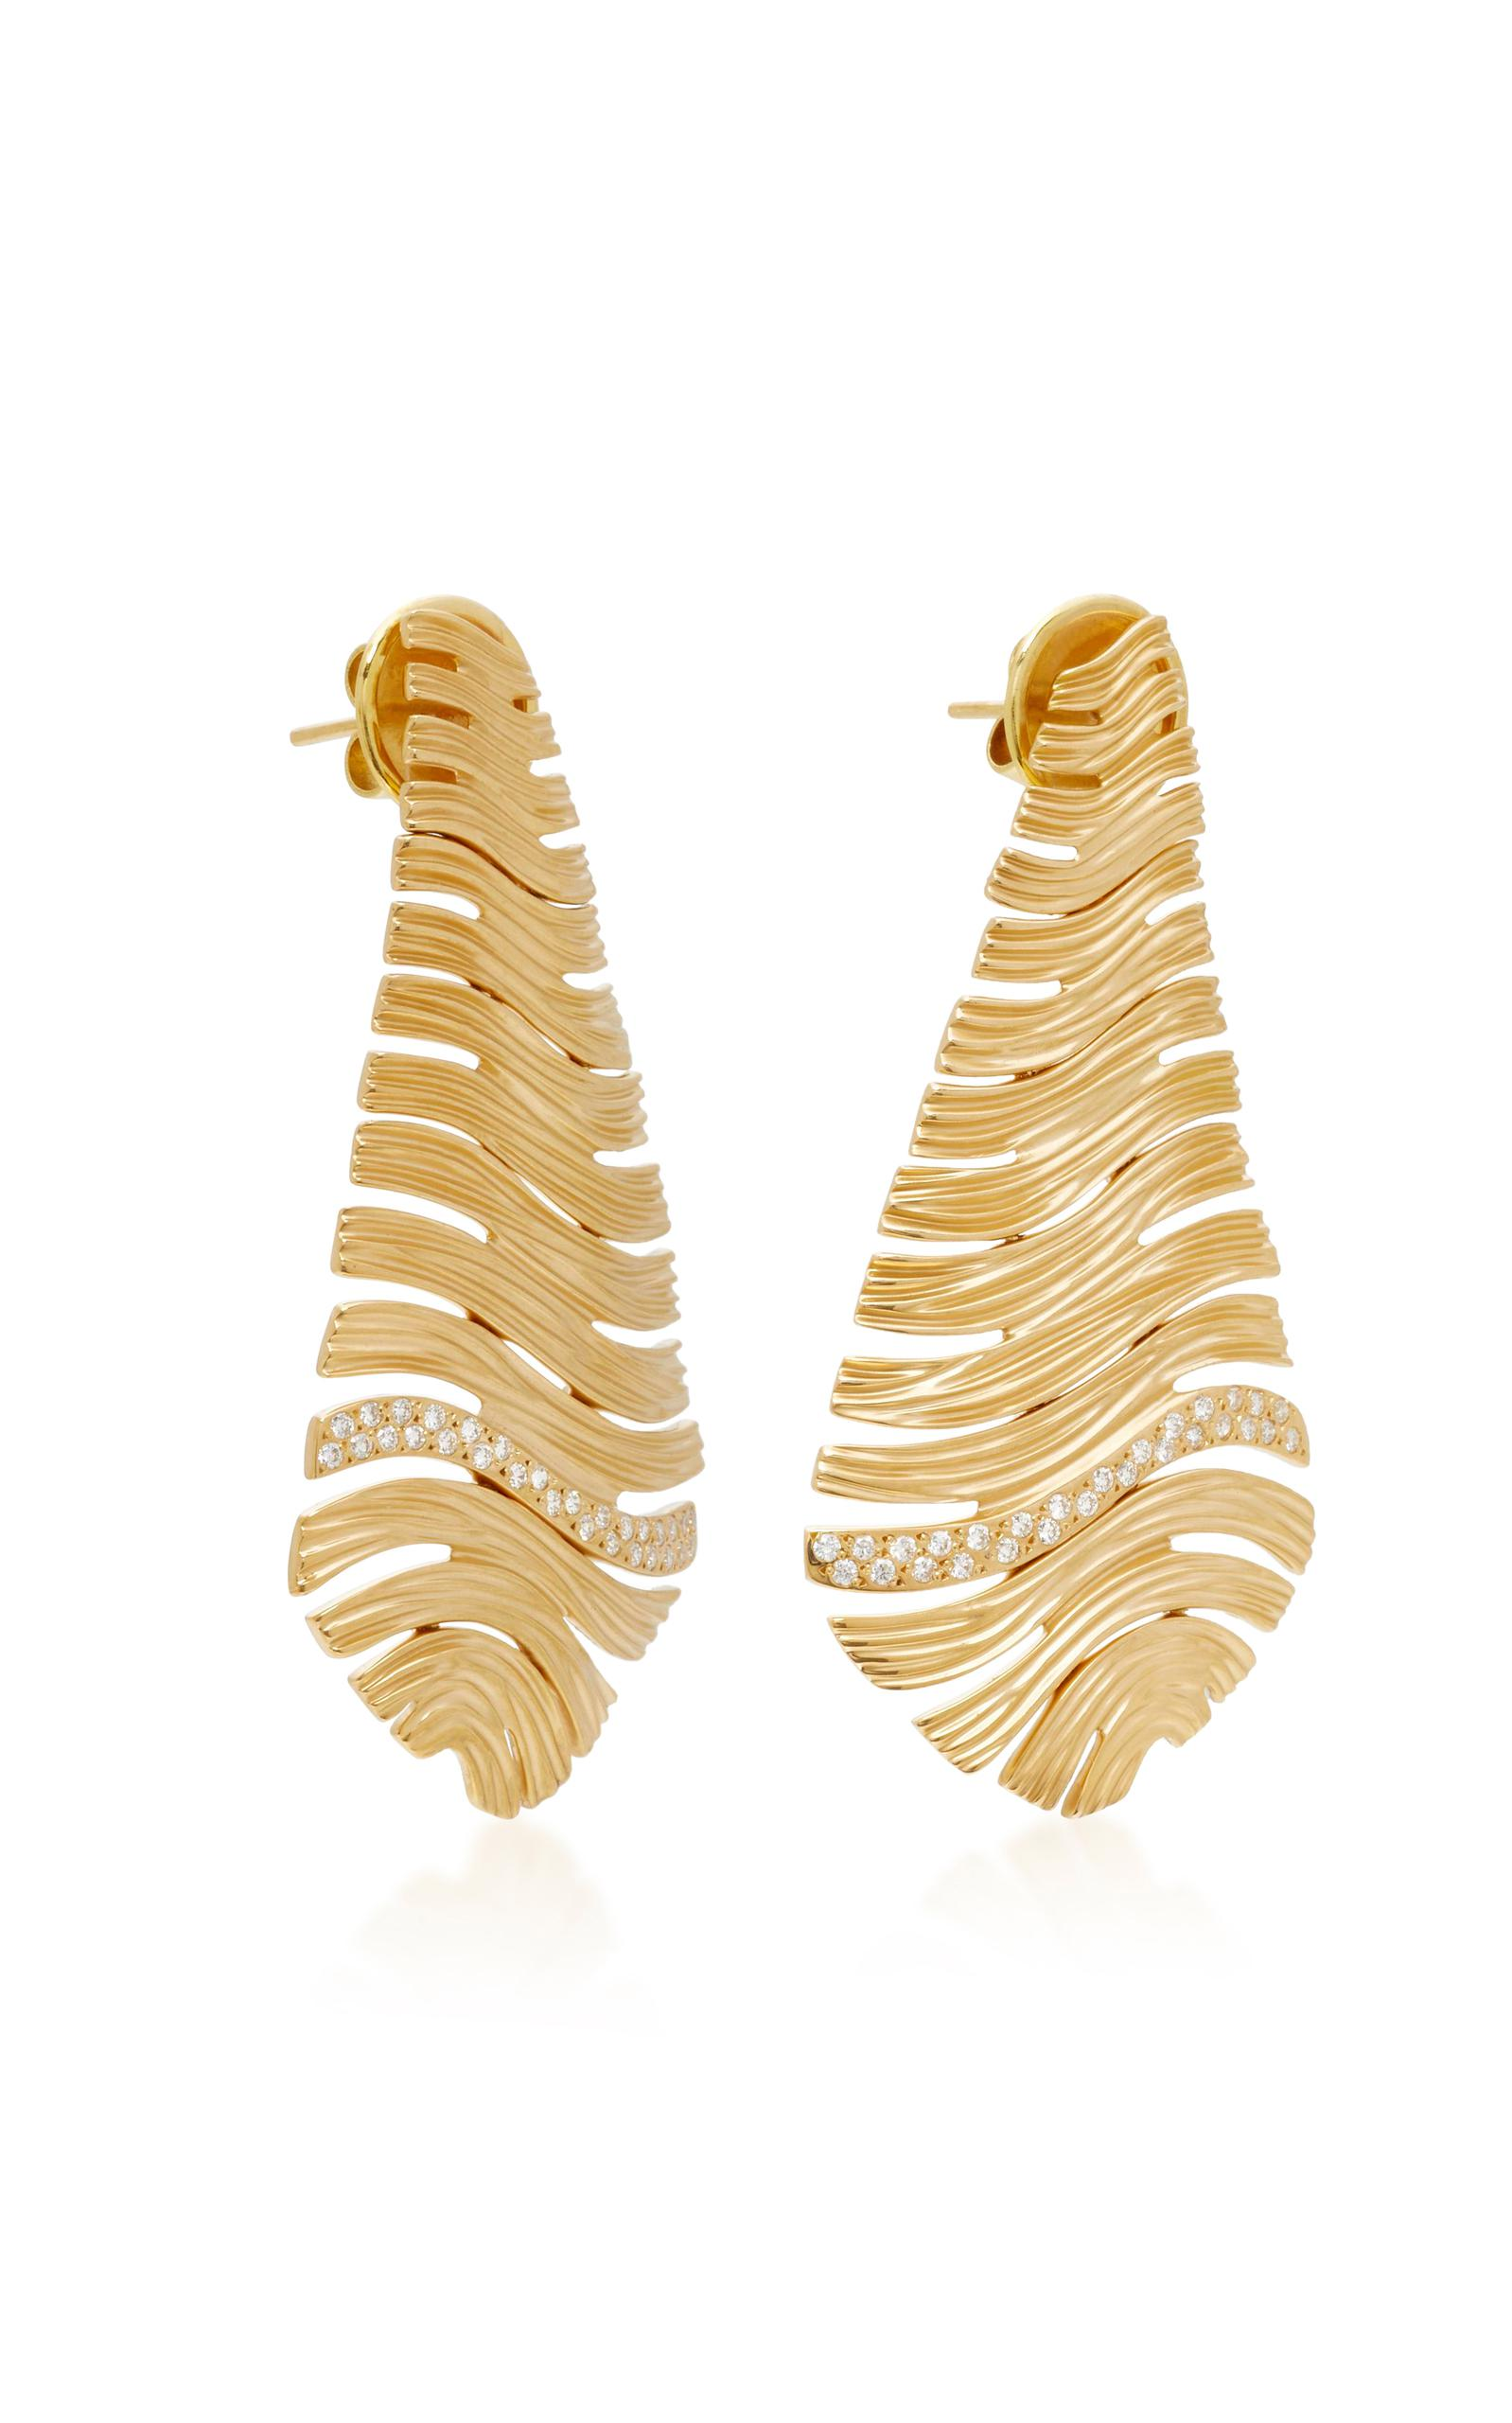 Plisse 18K Gold Diamond Earrings Hueb BciHwQQAVh